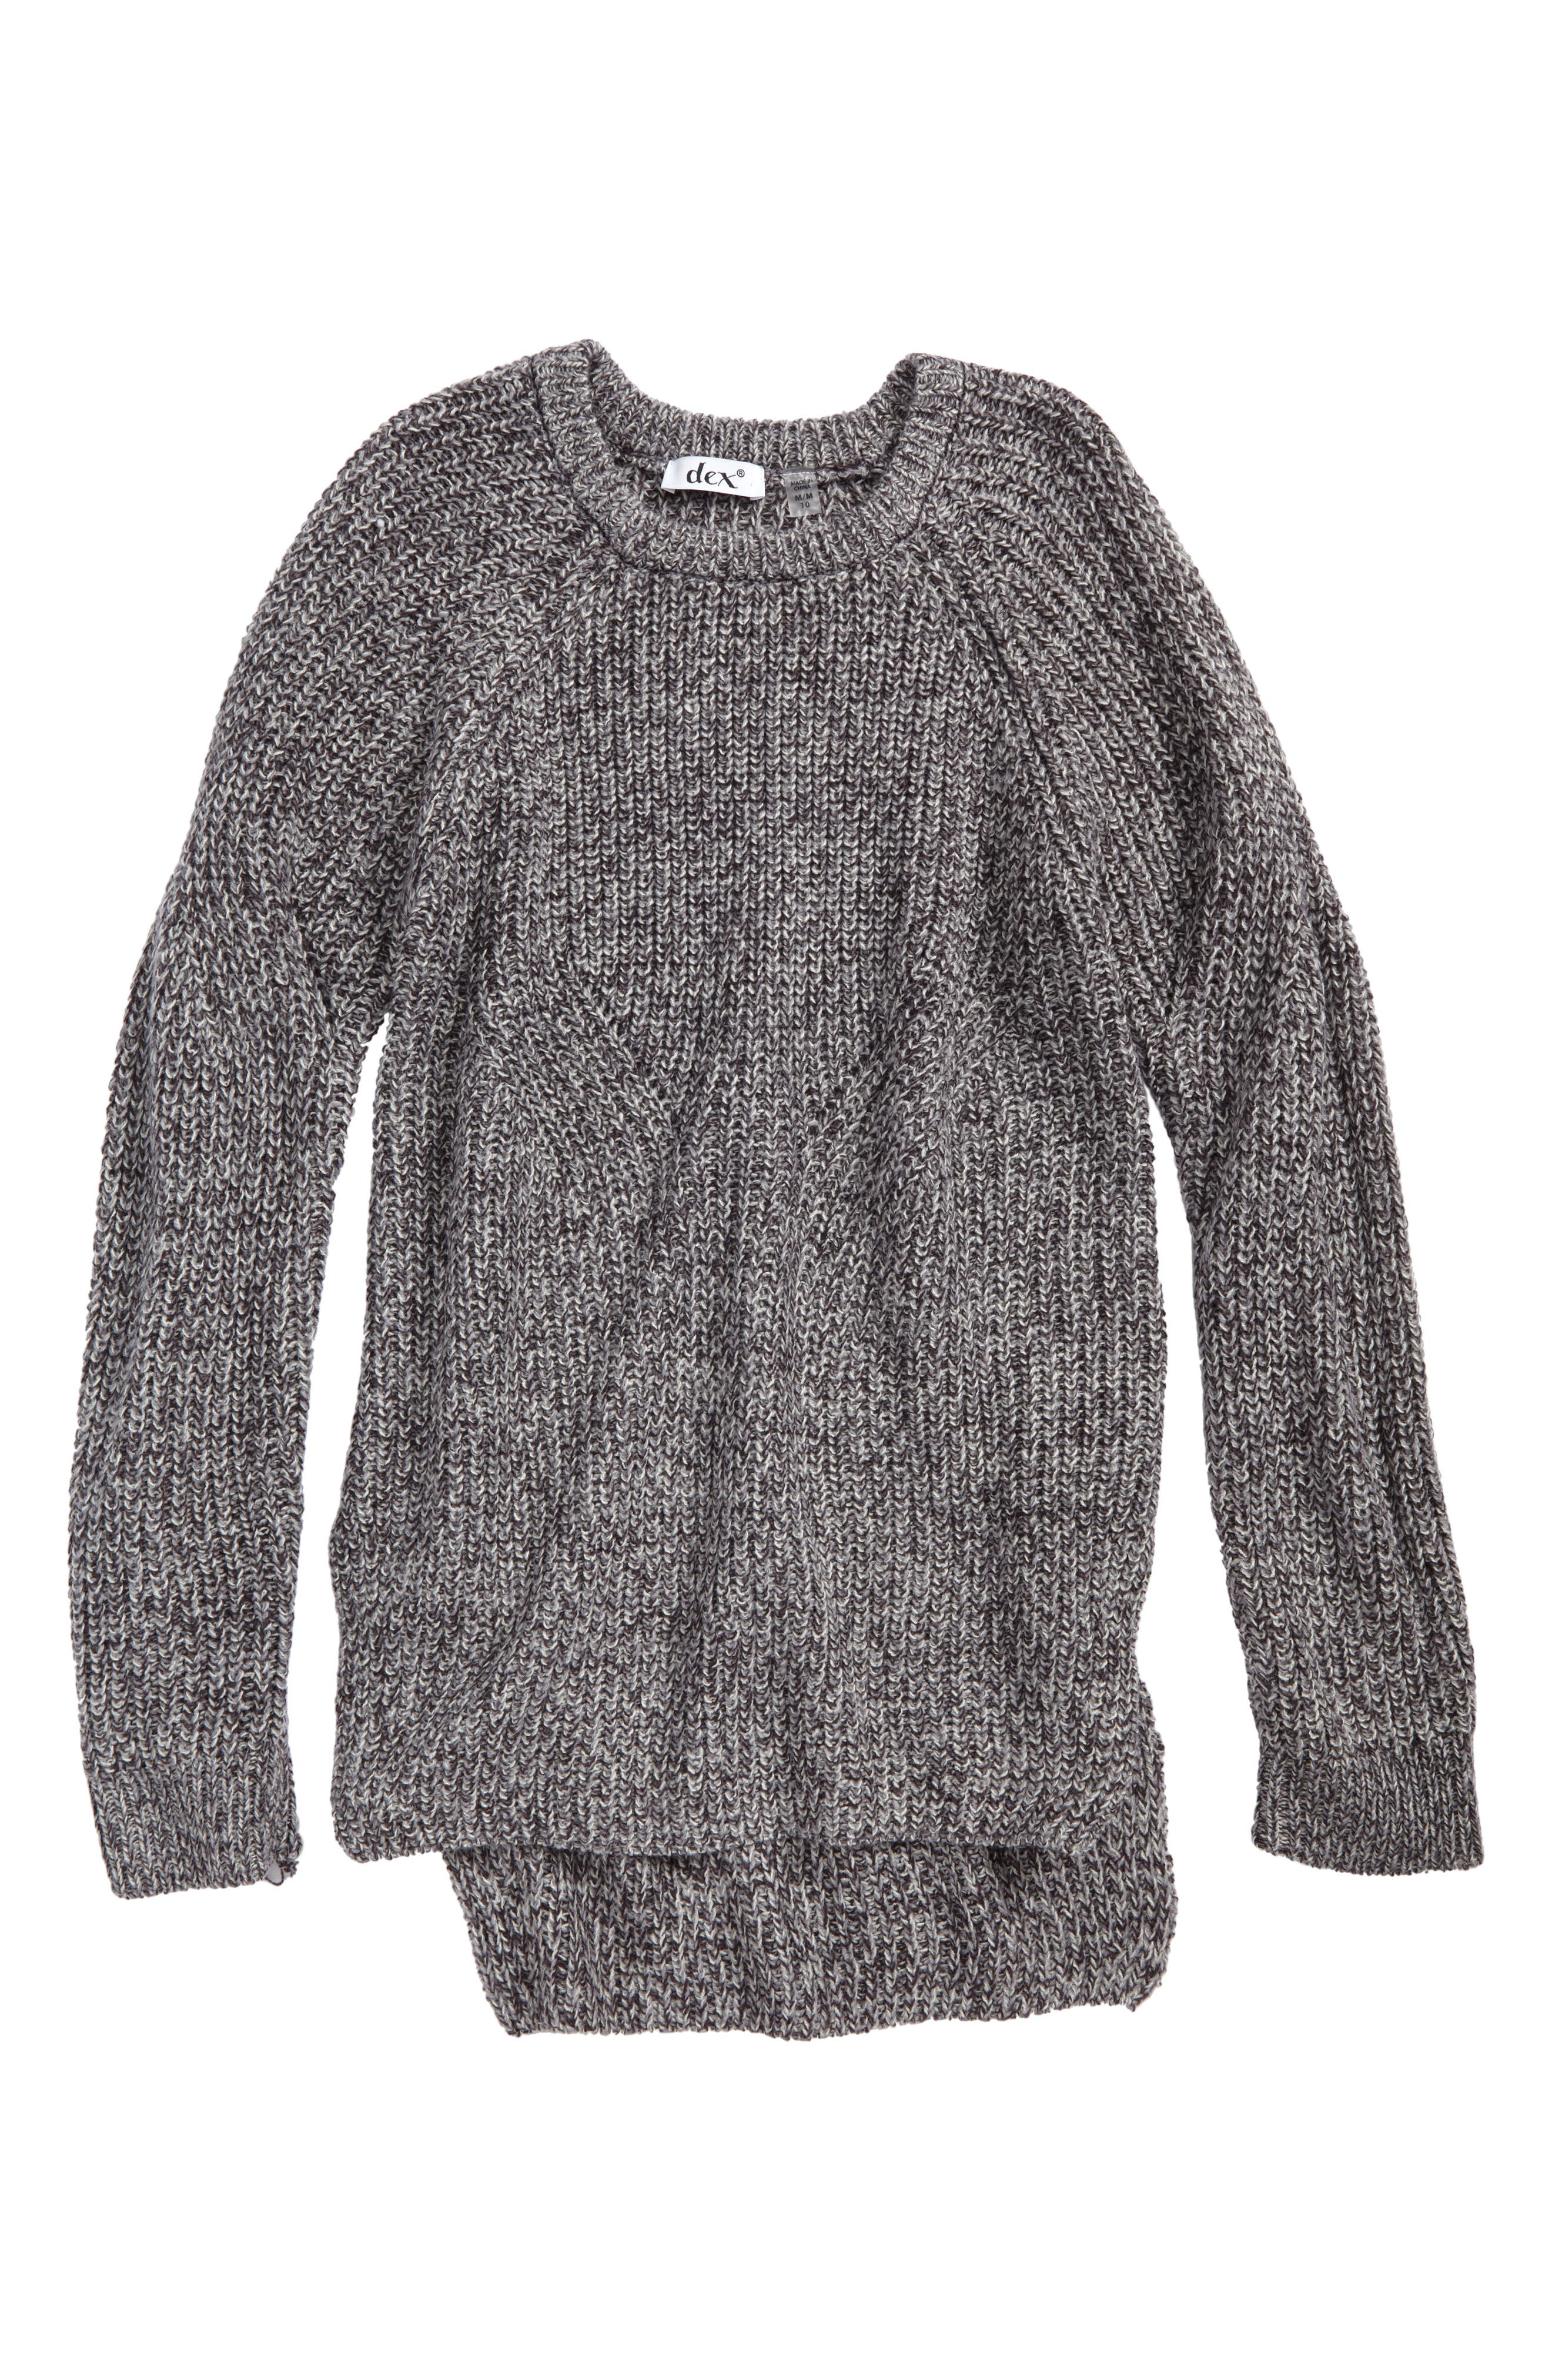 Rib Knit Sweater,                             Main thumbnail 1, color,                             Grey Twist